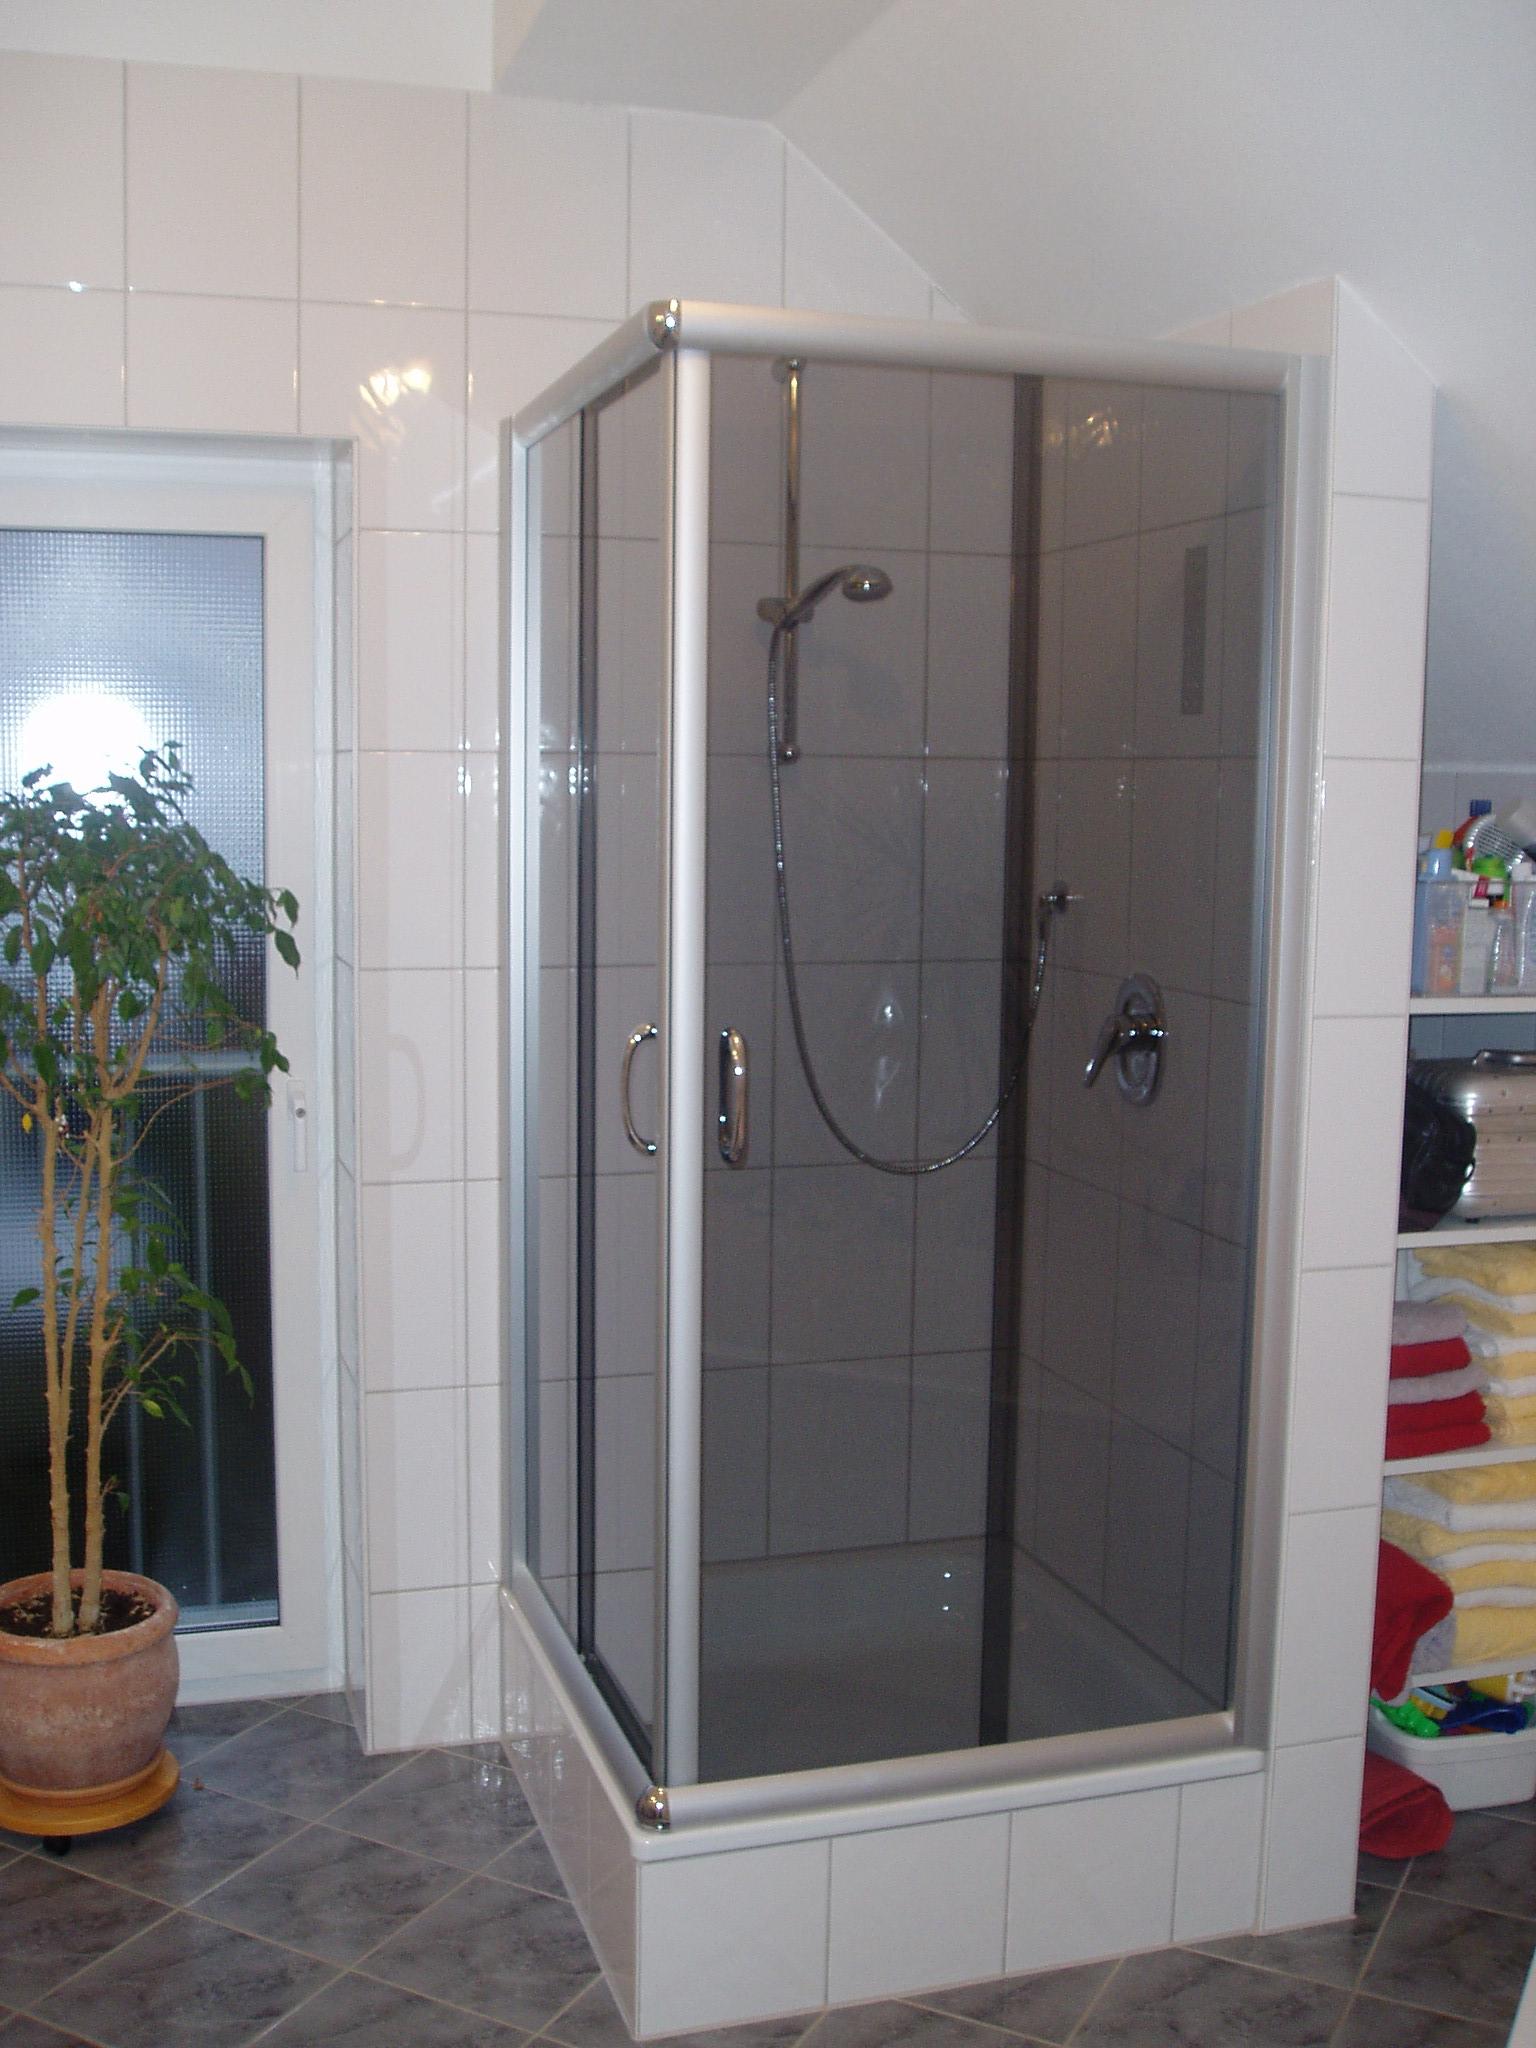 duschkabine 900 750 eckventil waschmaschine. Black Bedroom Furniture Sets. Home Design Ideas